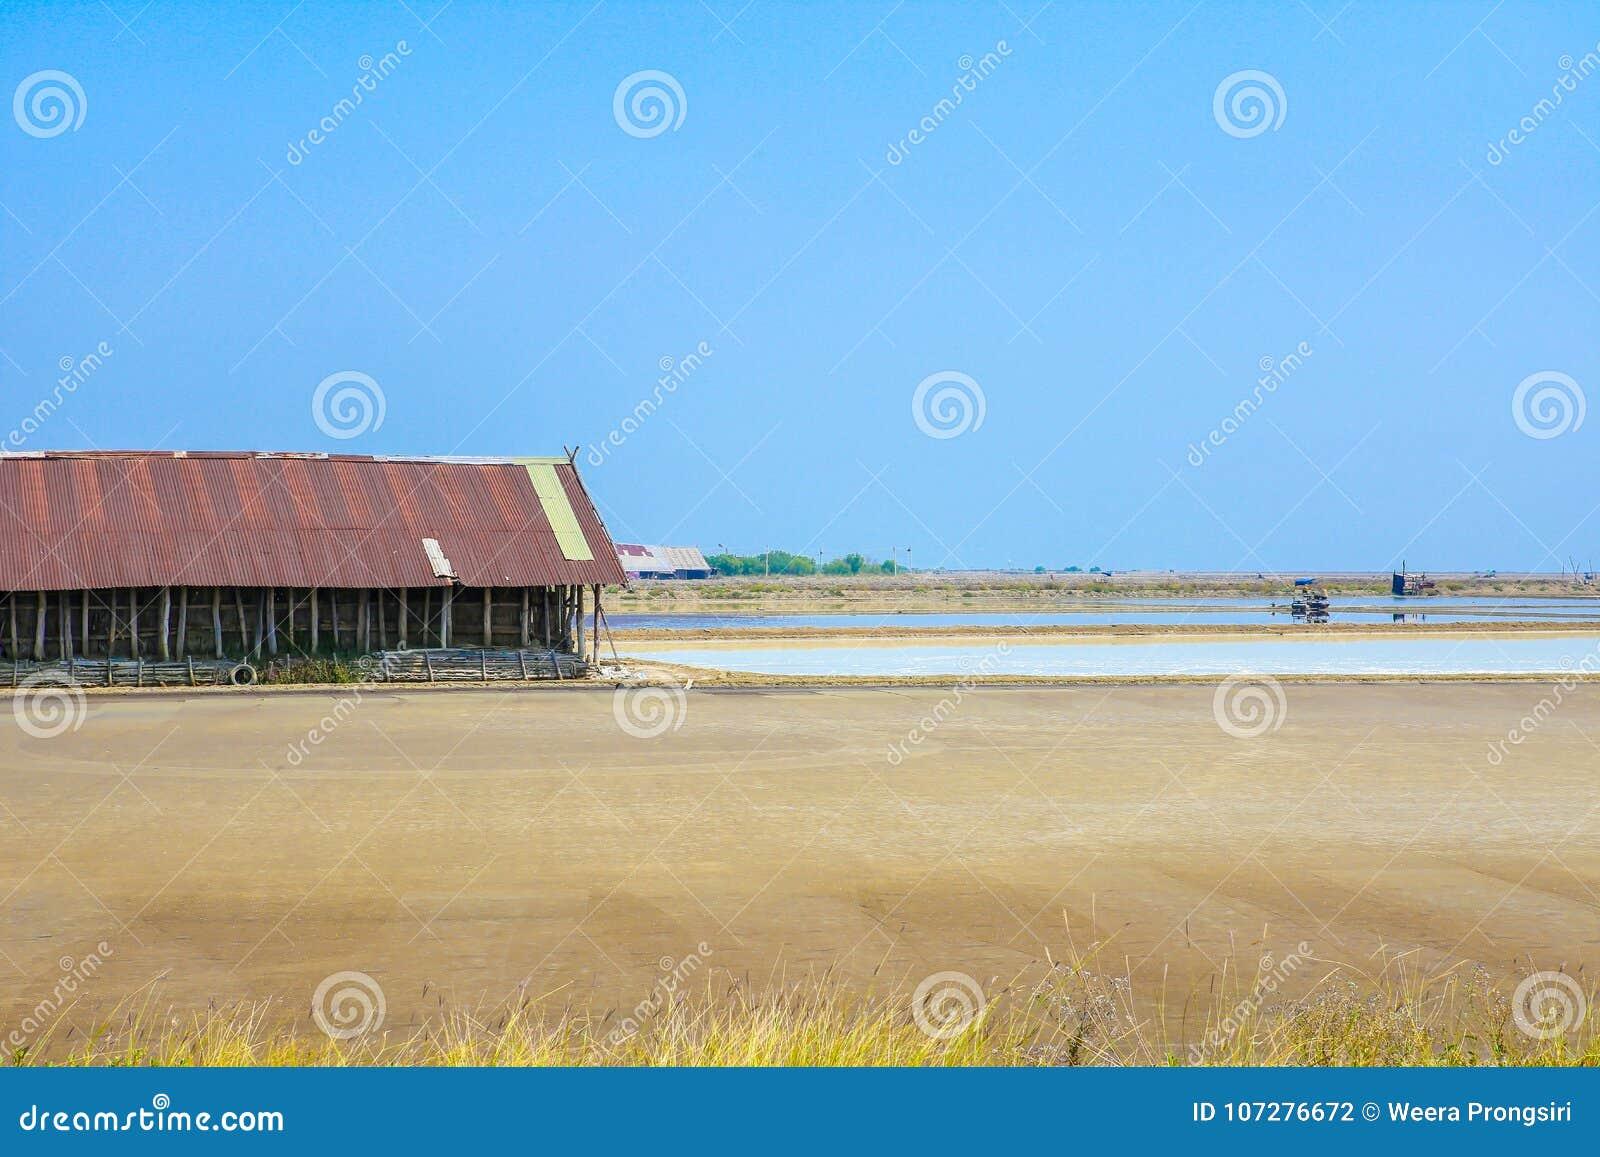 Overzees zout landbouwbedrijf